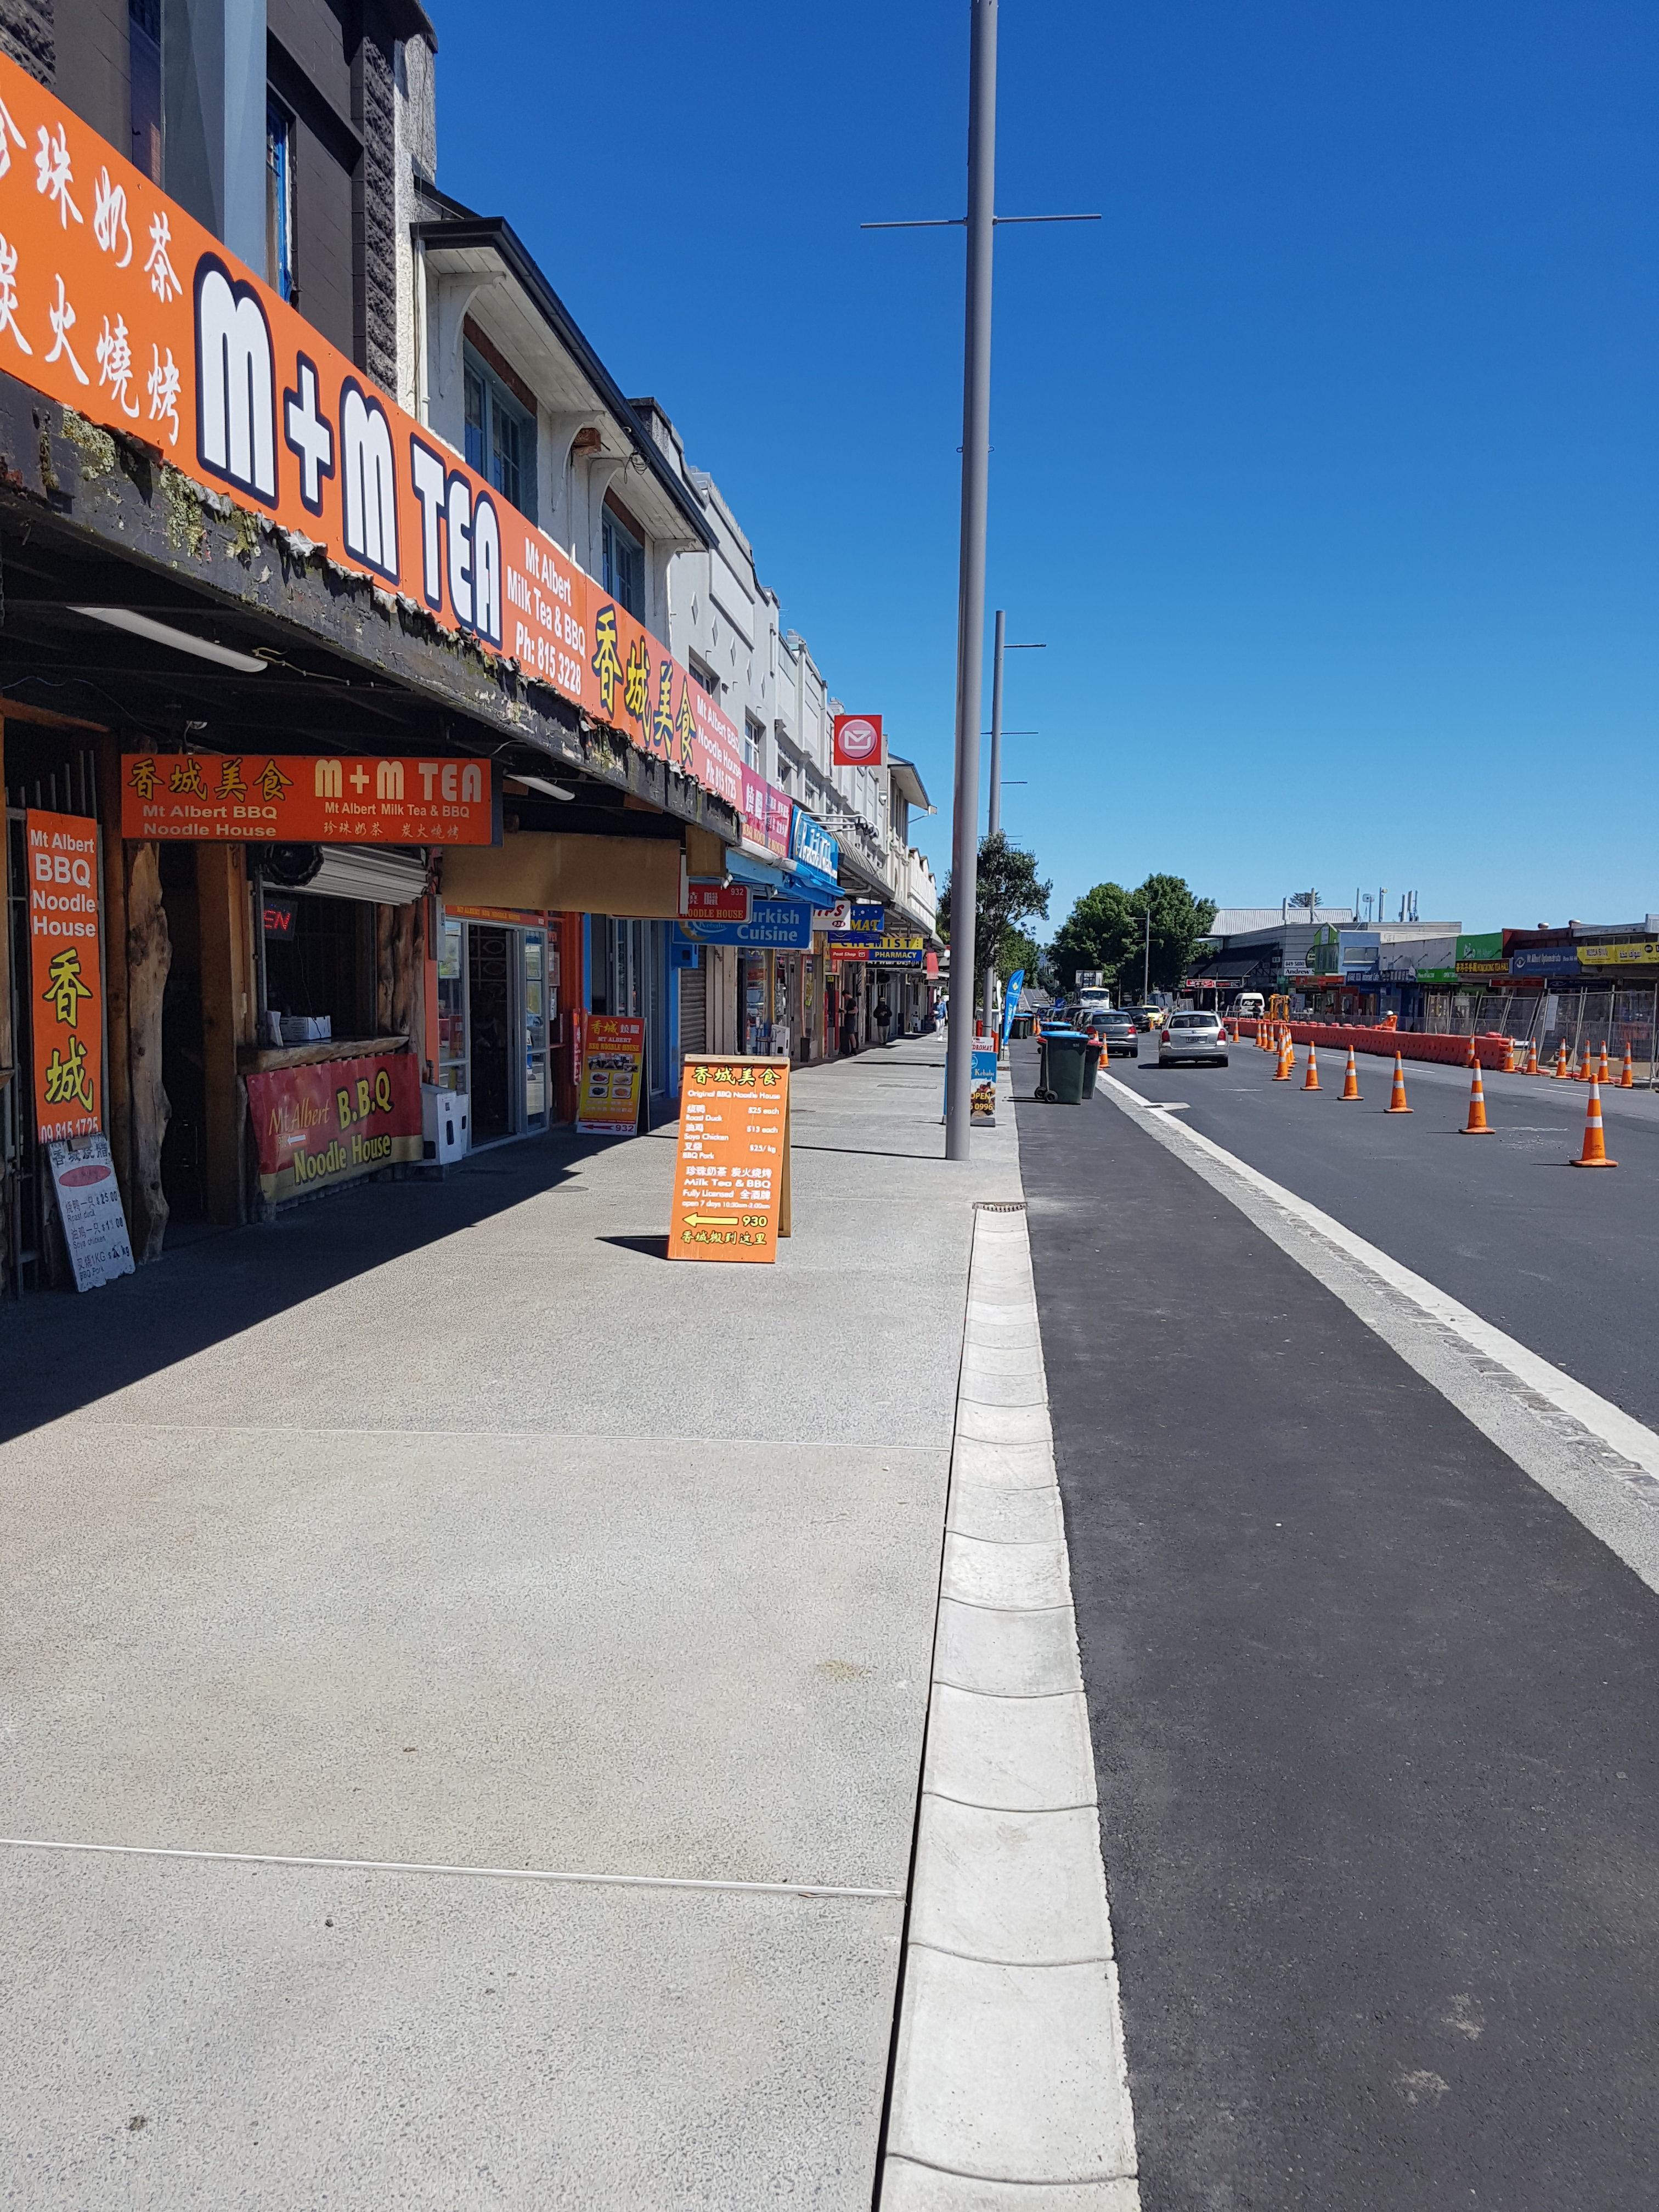 Footpath reinforced with fibre concrete